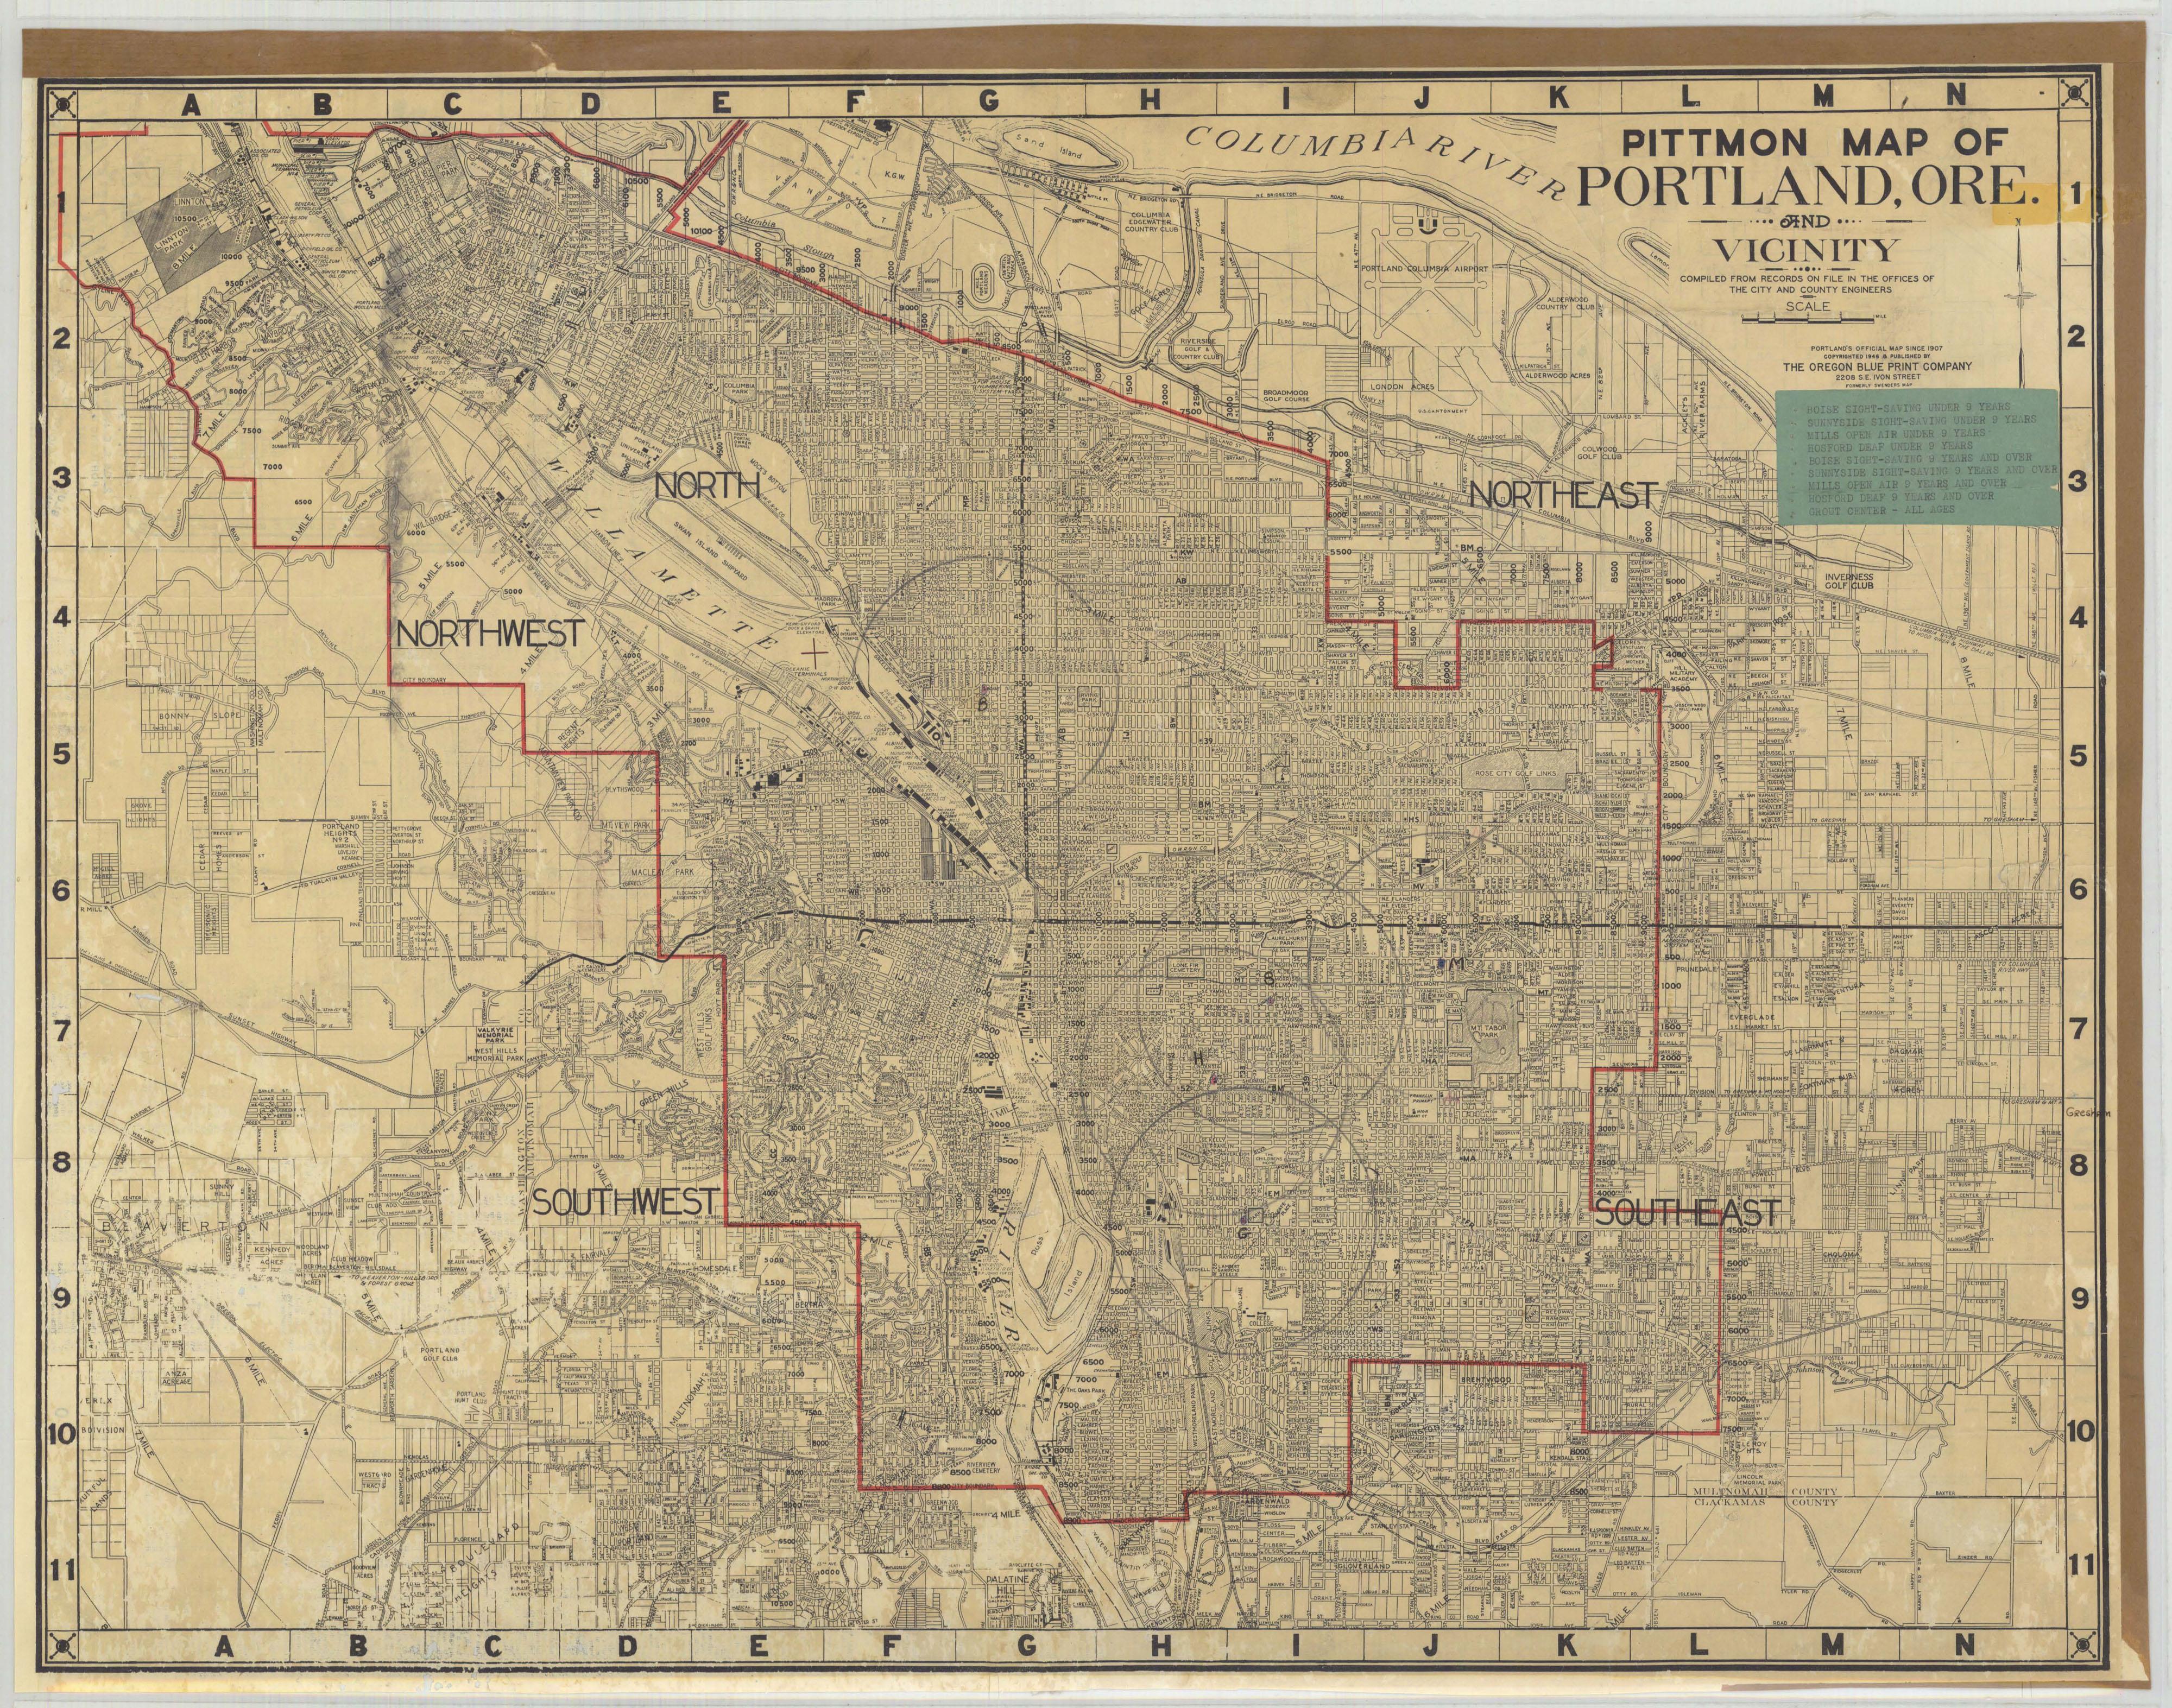 Vintage Oregon Map.Pittmon Map Of Portland 1946 Vintage Portland